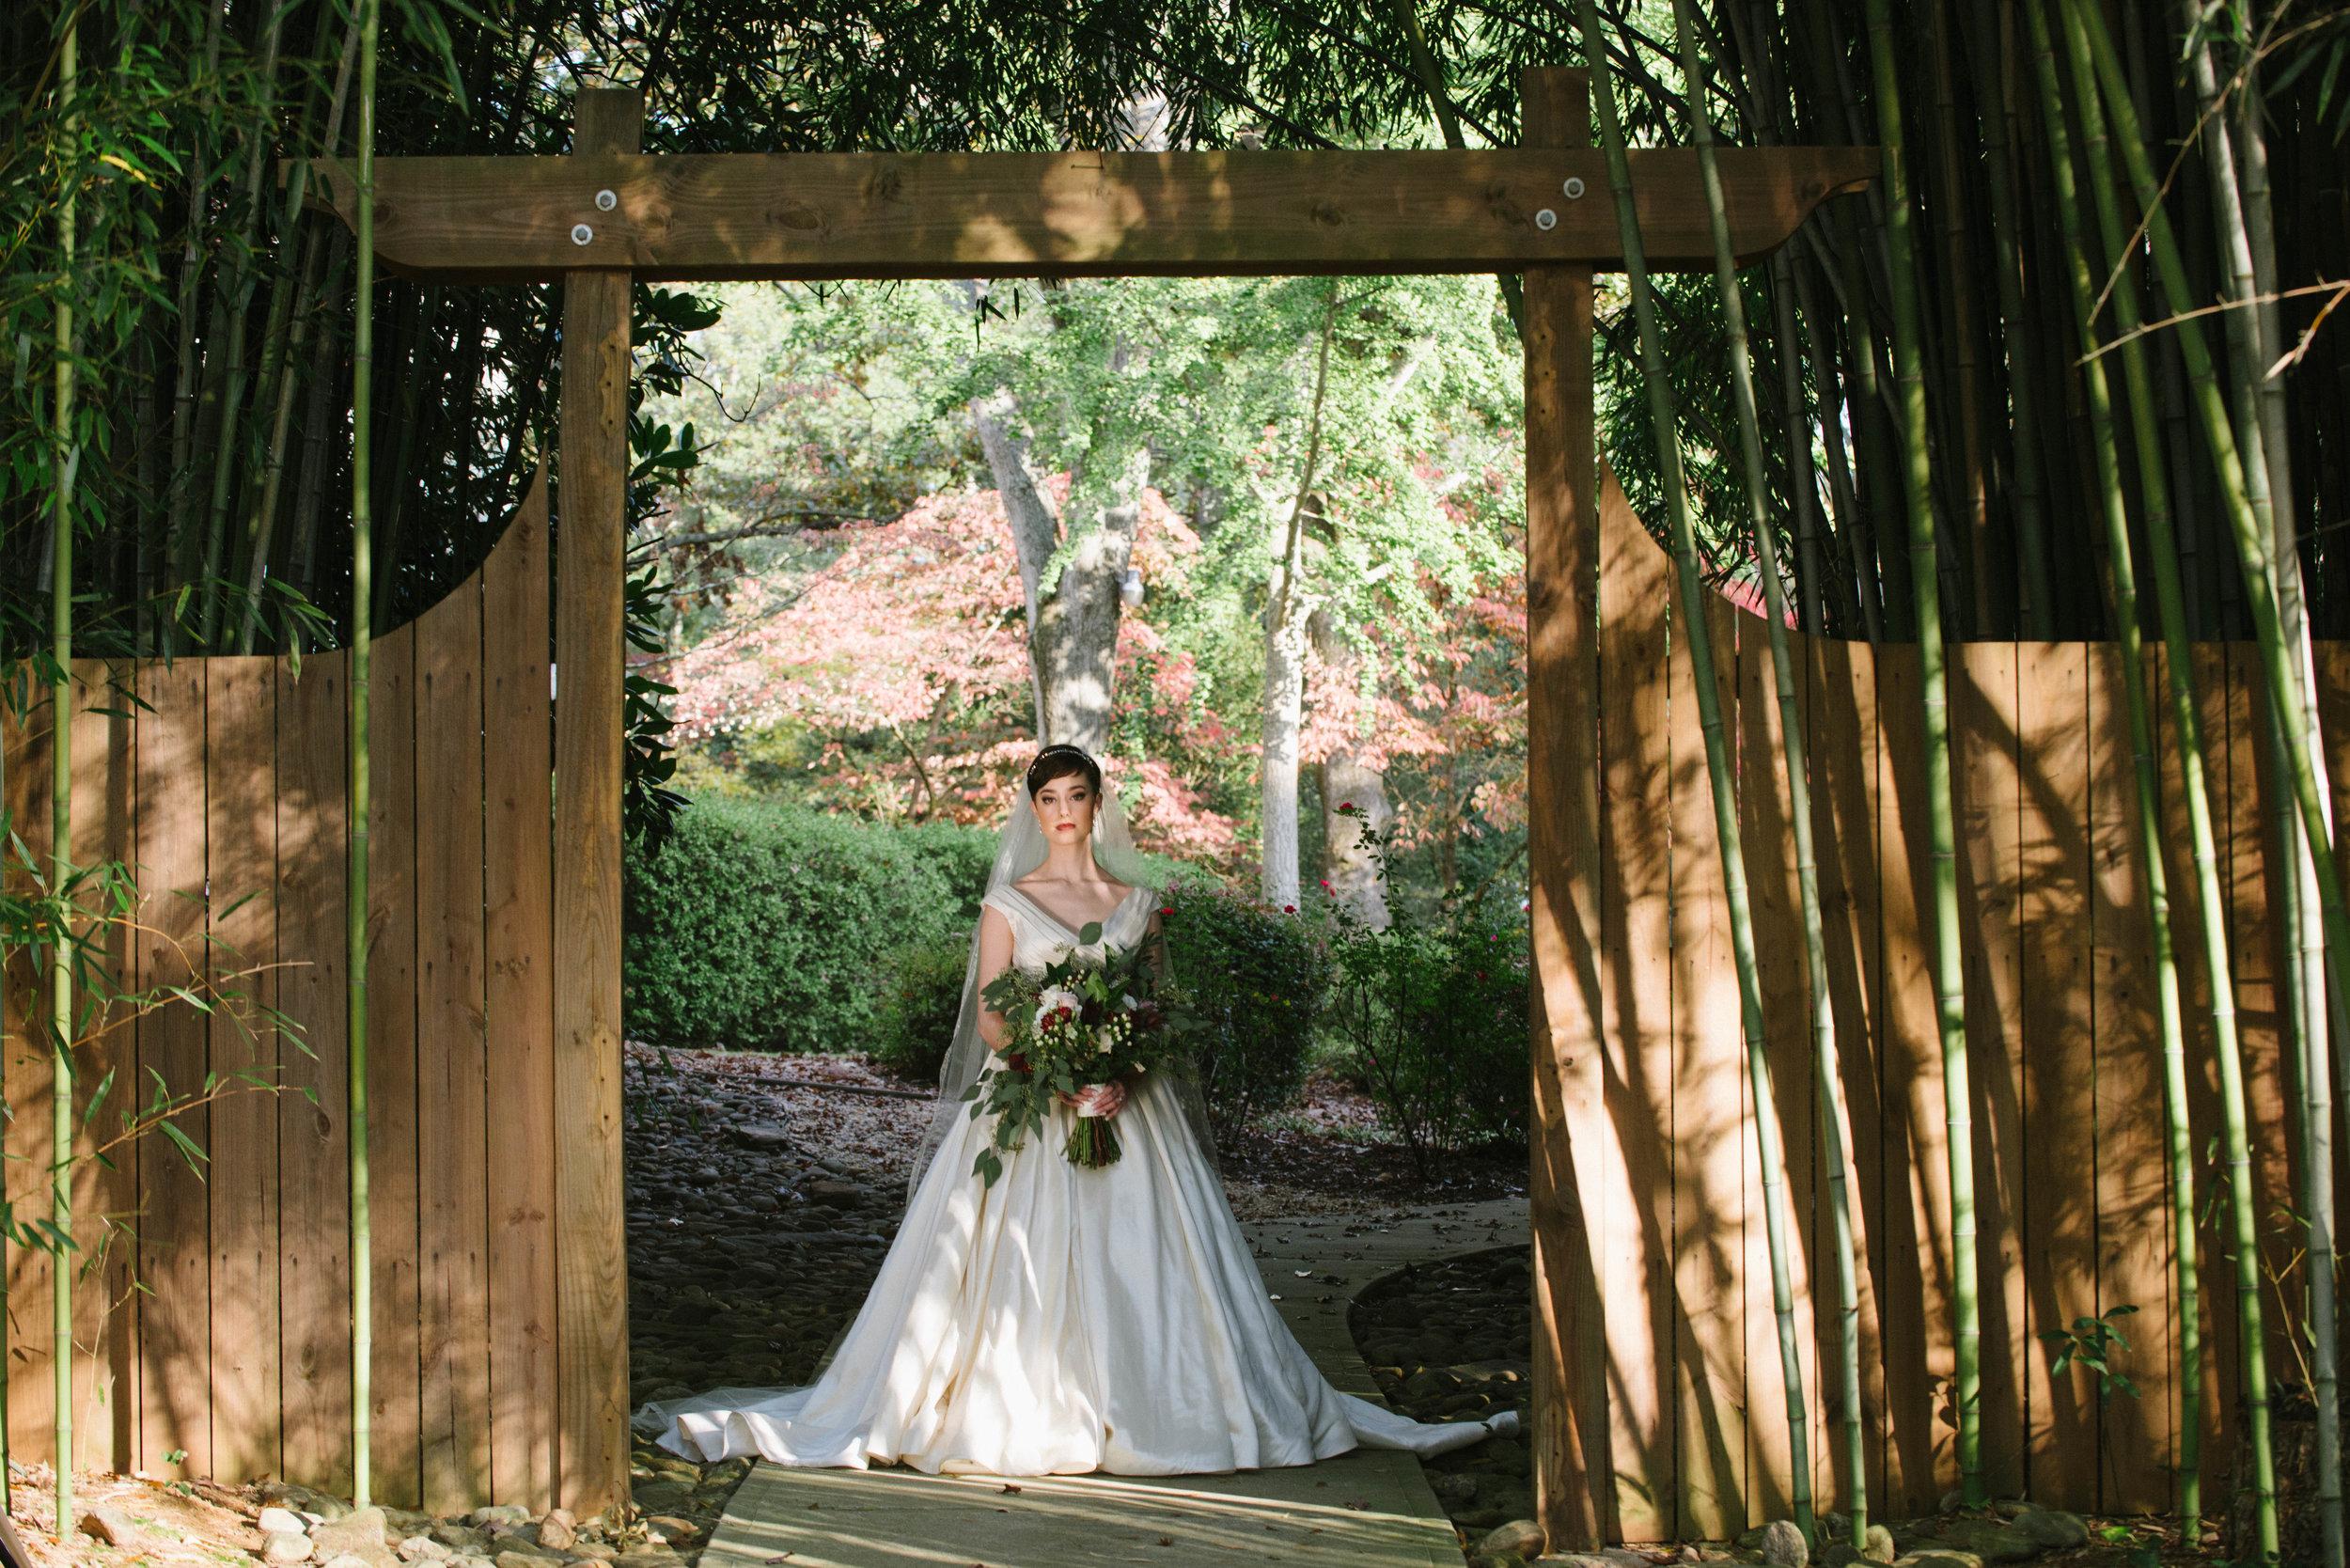 CarolineMerritt|Bridals|_Color_MiraPhotographs-95.jpg